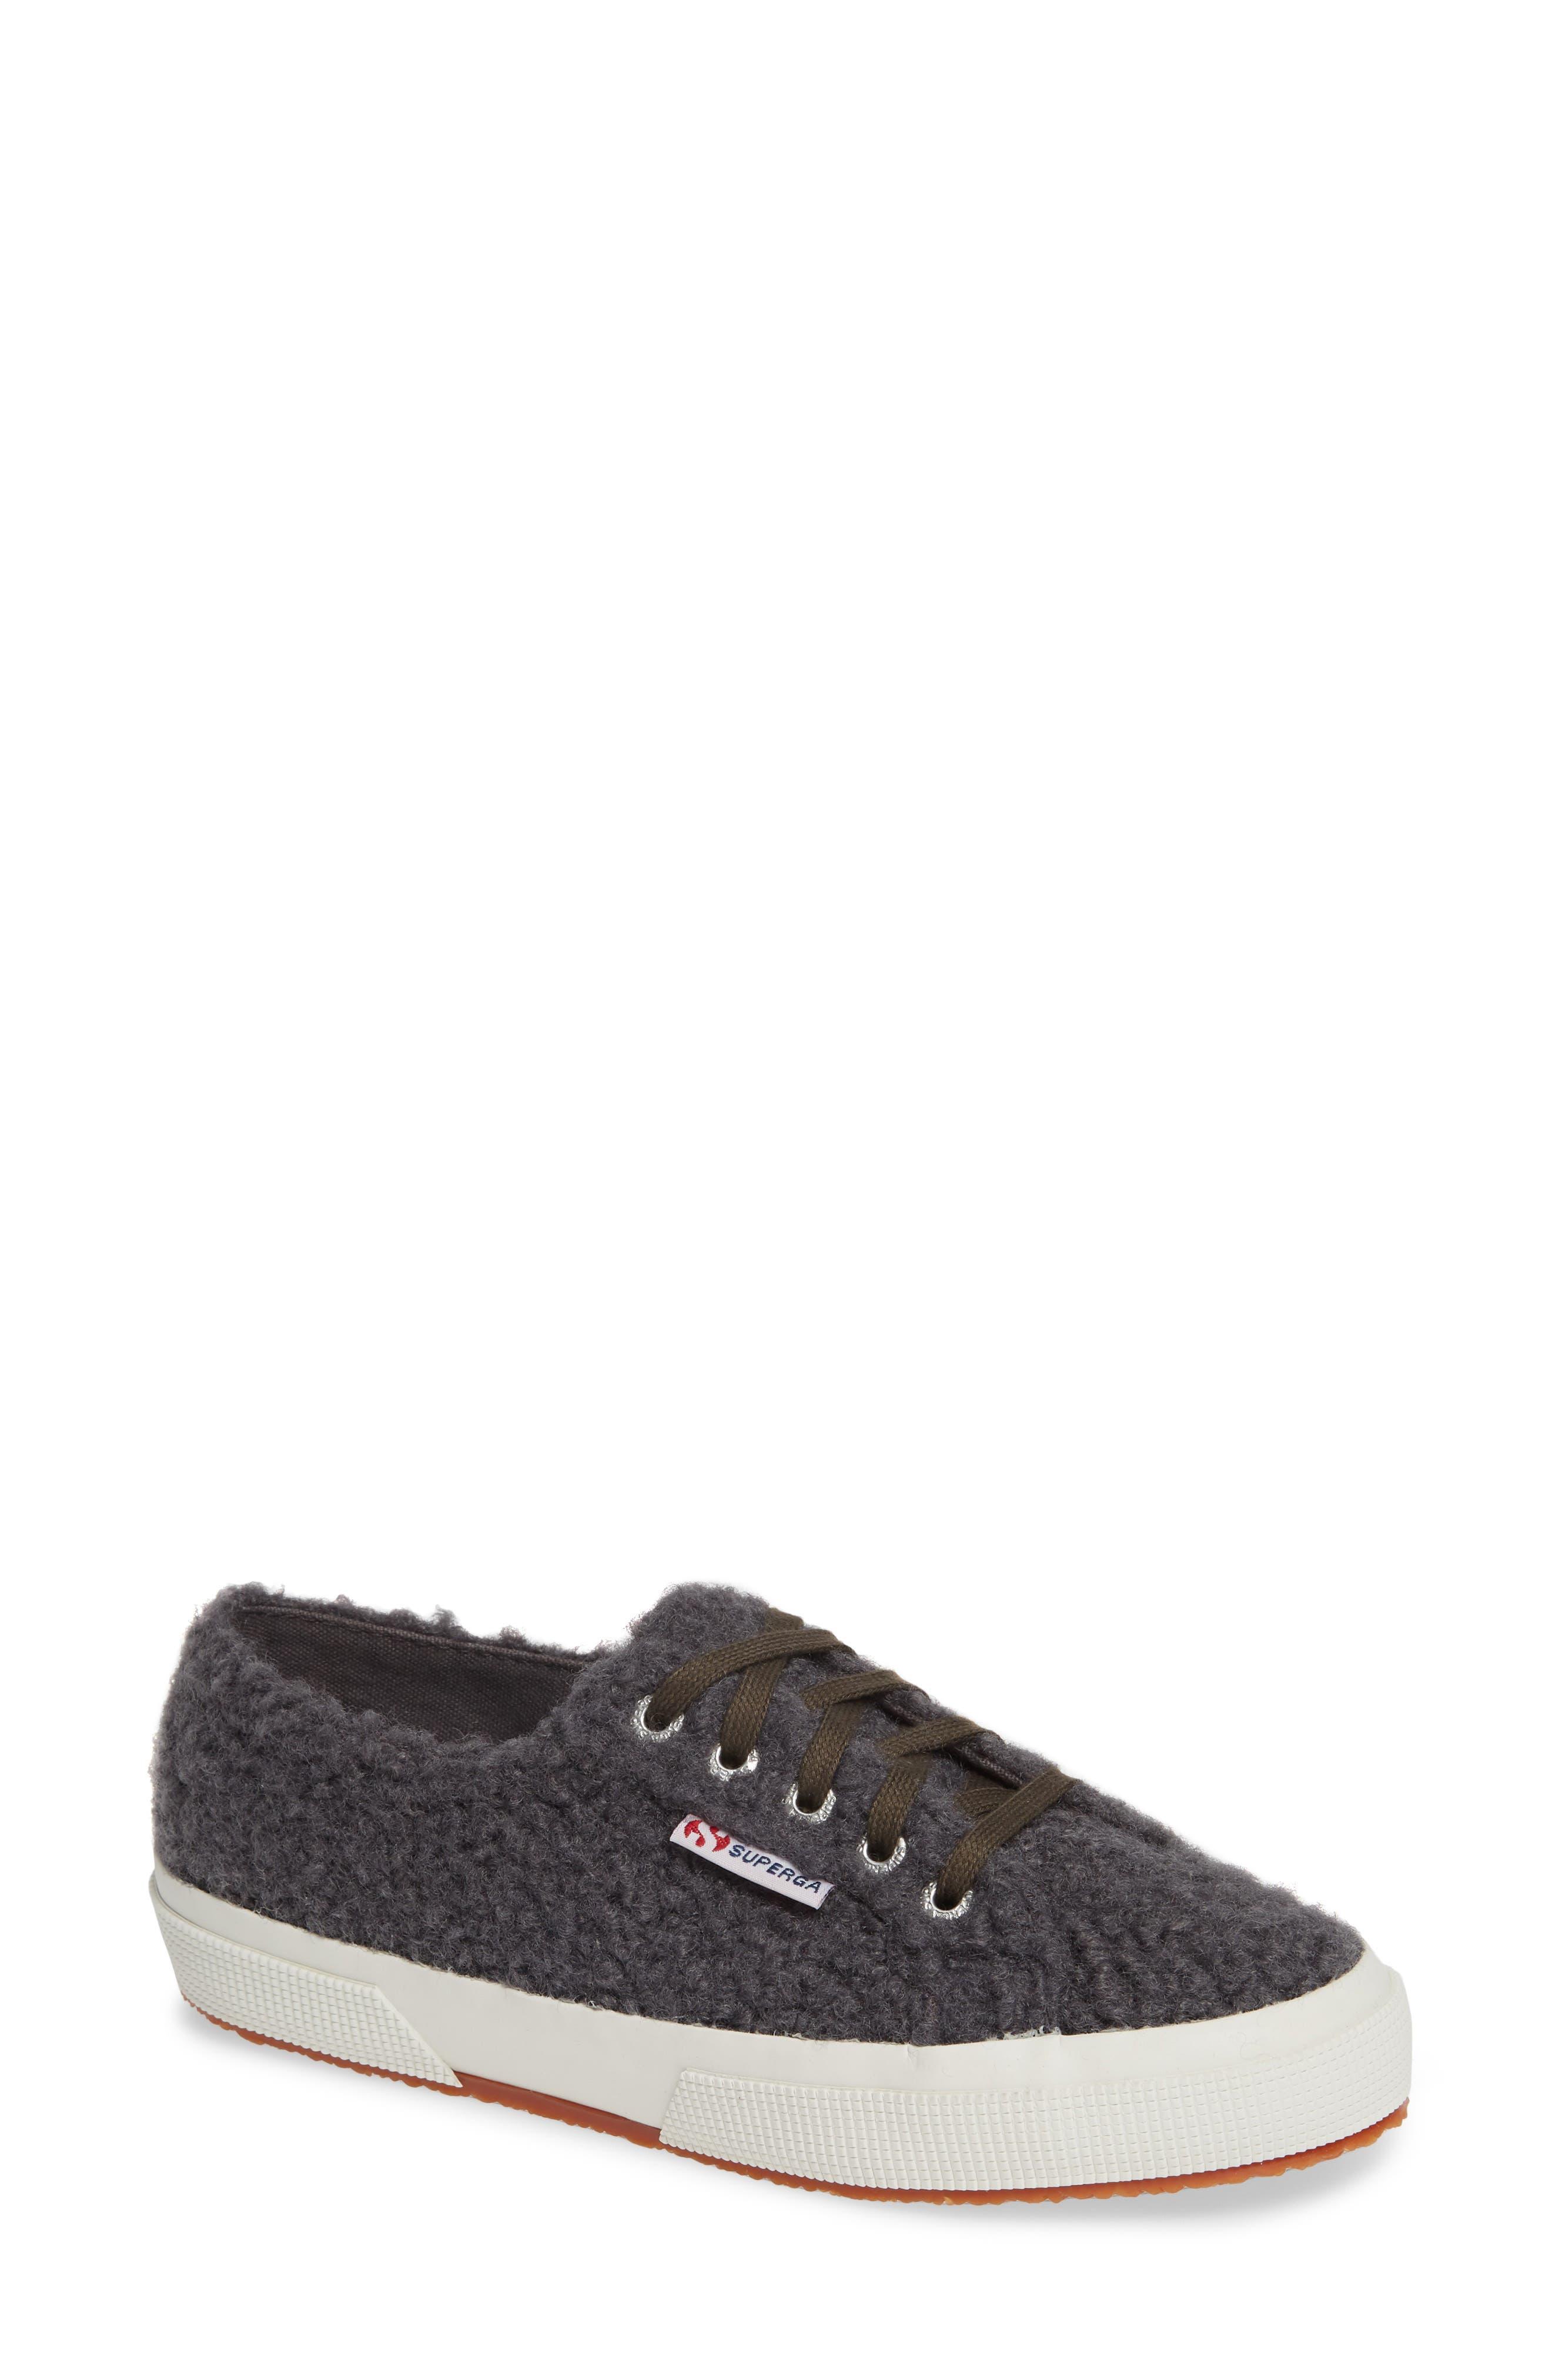 2759 Curly Wool Sneaker,                         Main,                         color, DARK GREY/ GREY